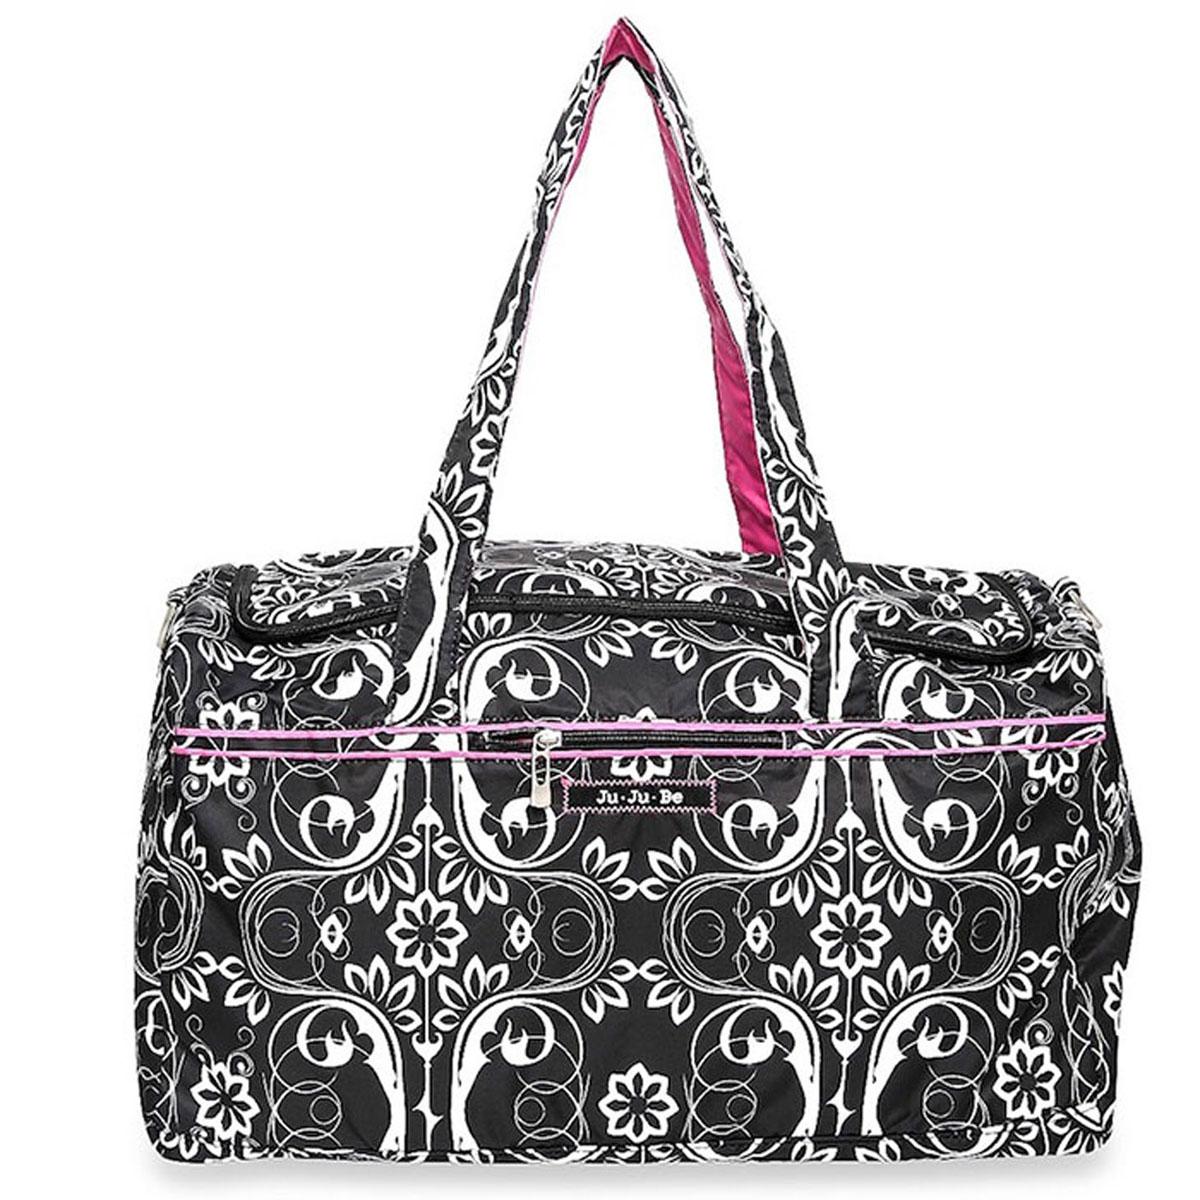 Ju-Ju-Be Сумка дорожная Starlet Shadow Waltz цвет черный белый розовый ju ju be сумка для мамы belight black out